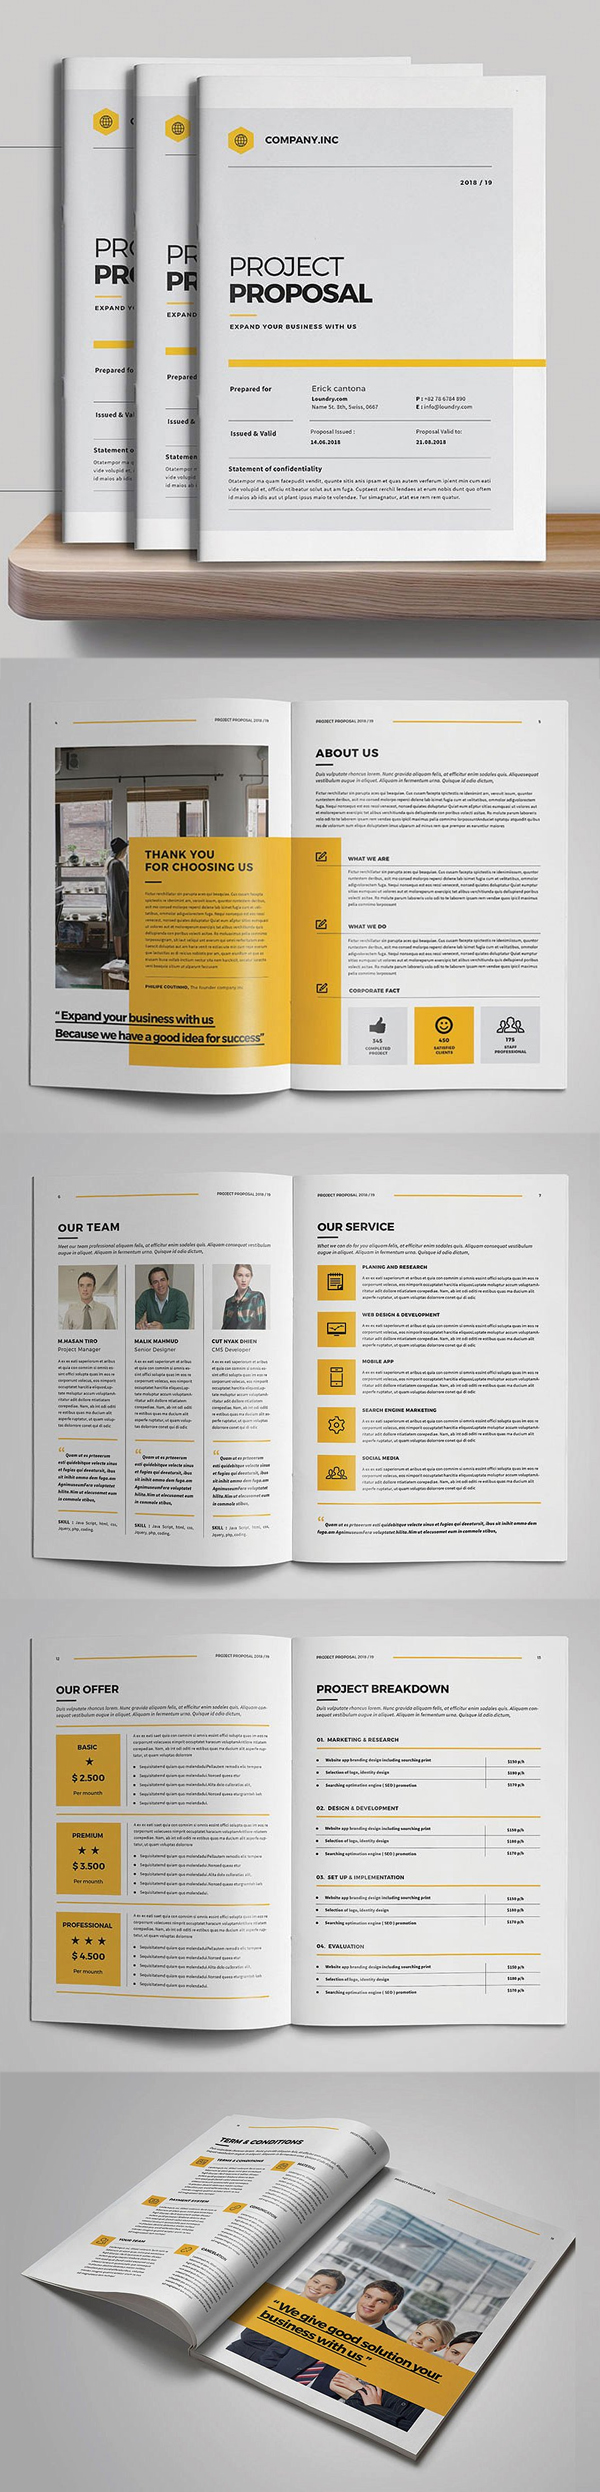 Professional Business Proposal Templates Design - 13